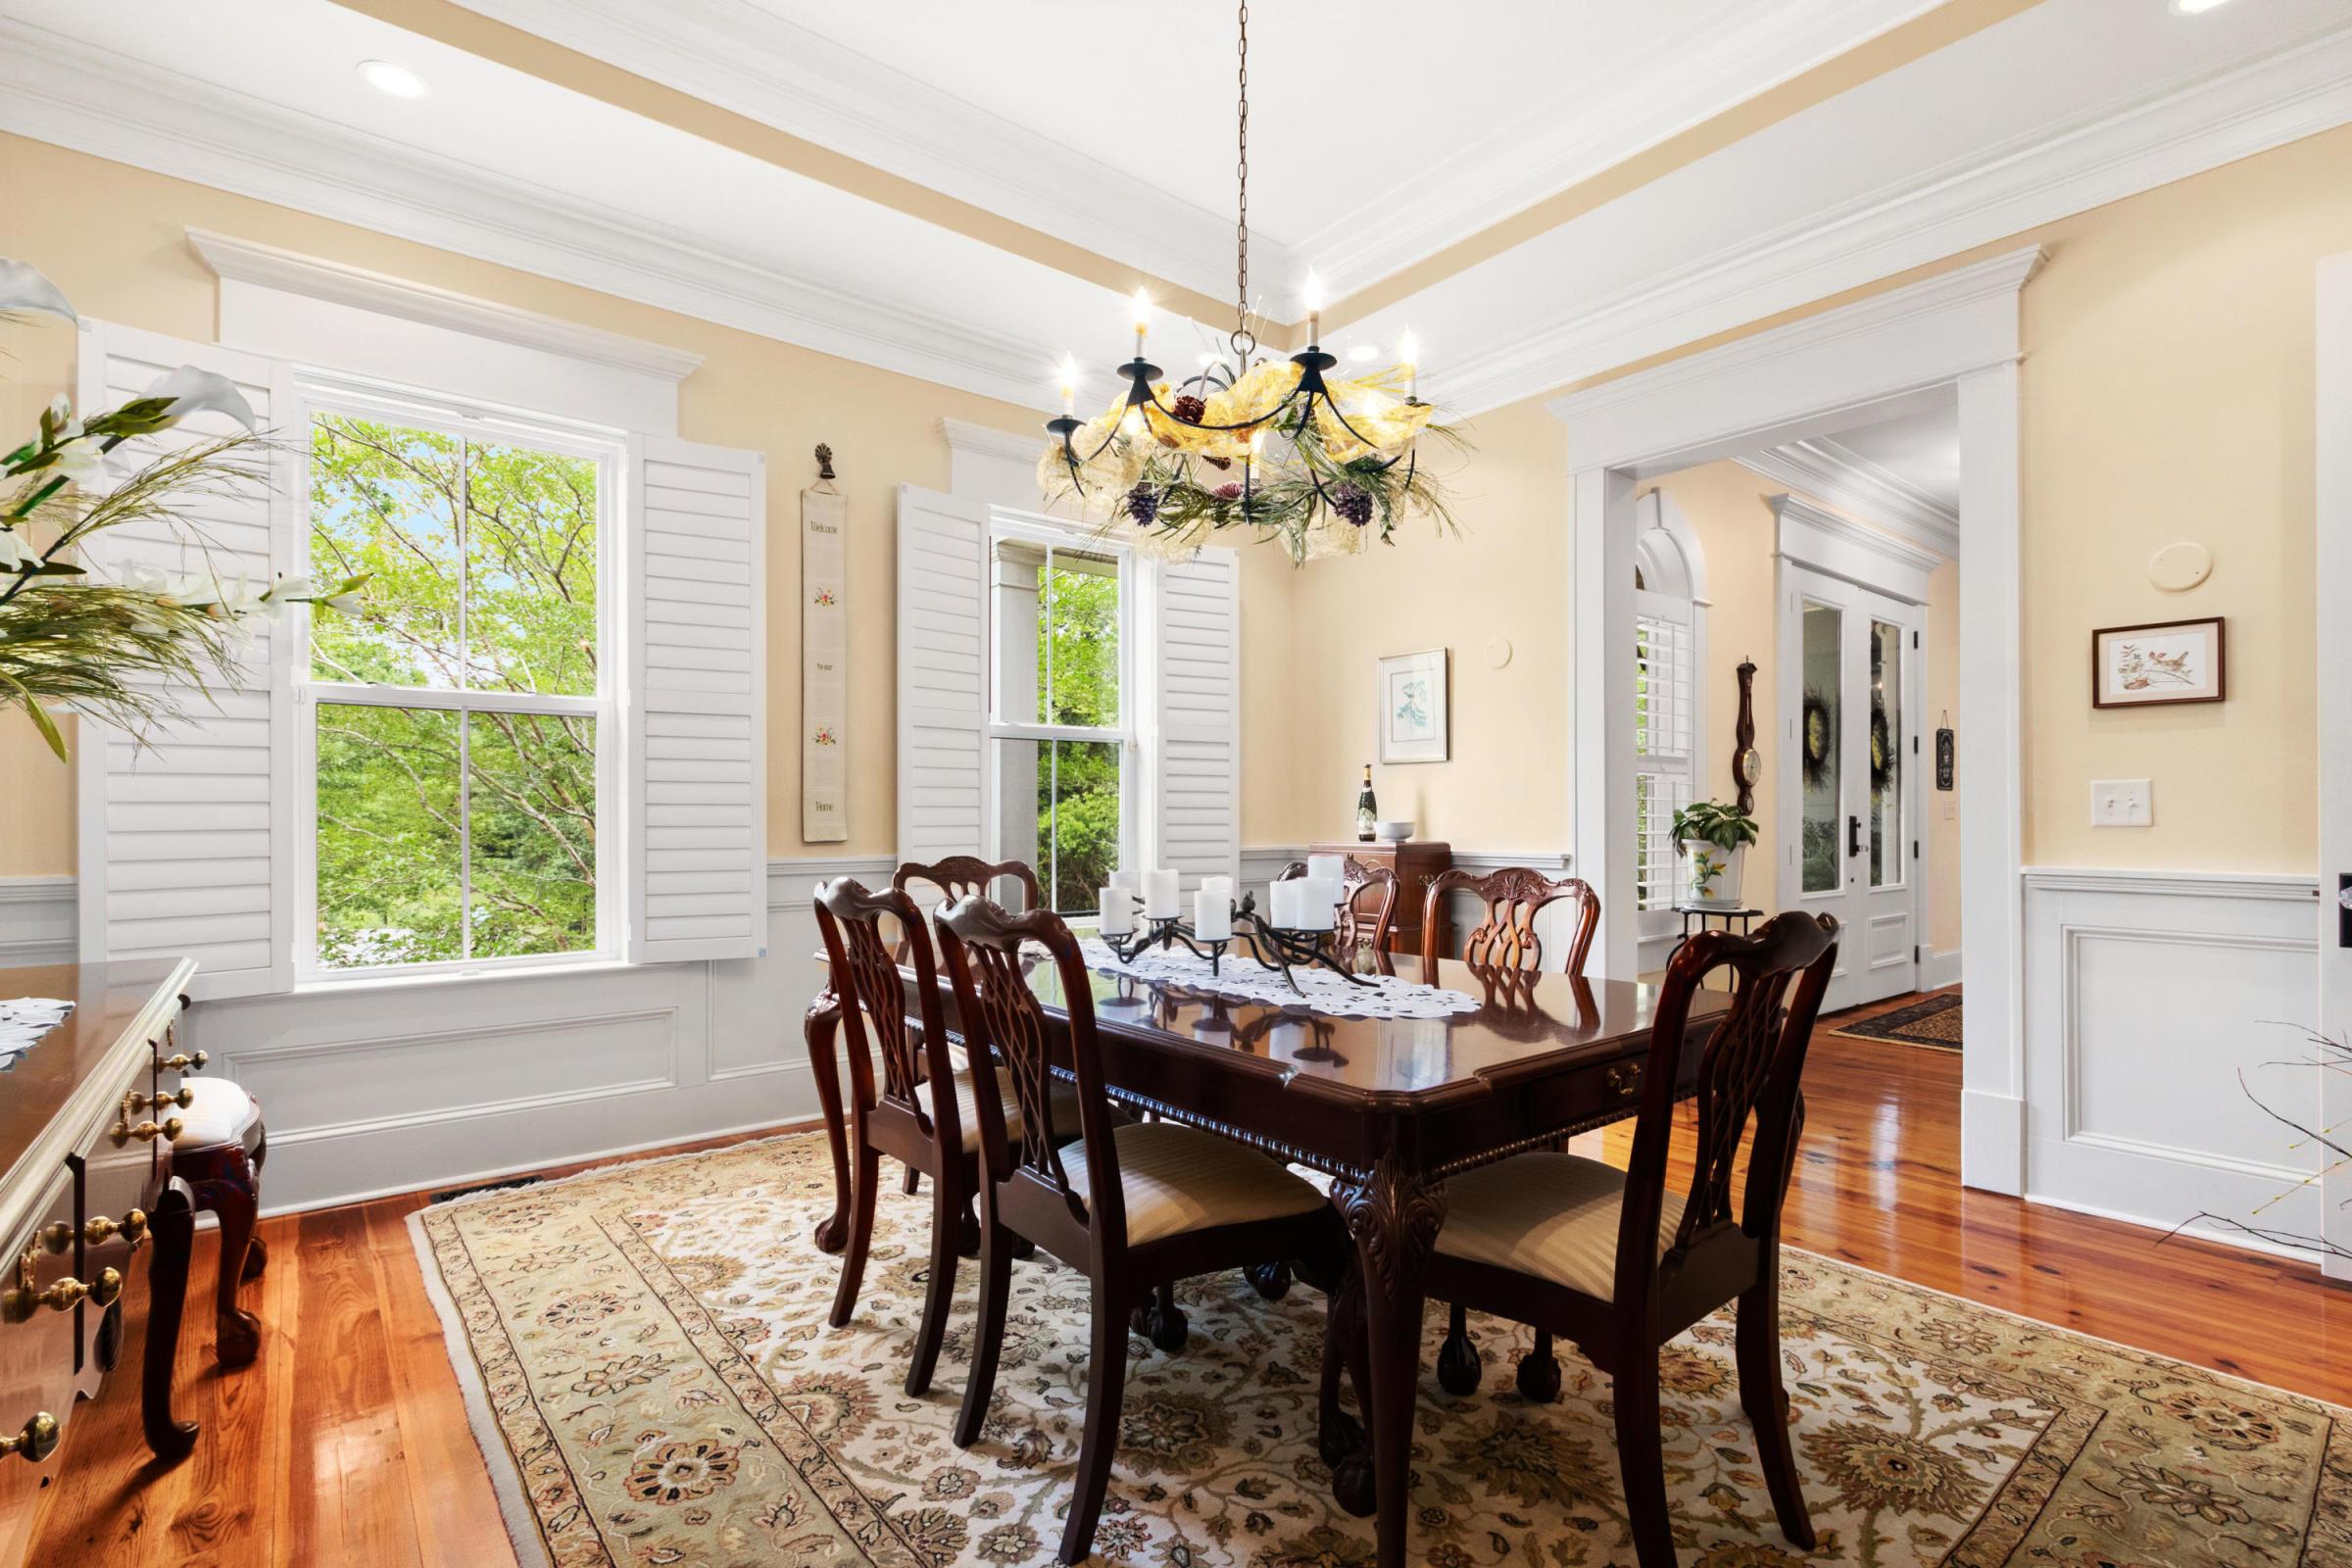 Broughton Hall Homes For Sale - 2058 Lakeshore, Pinopolis, SC - 41